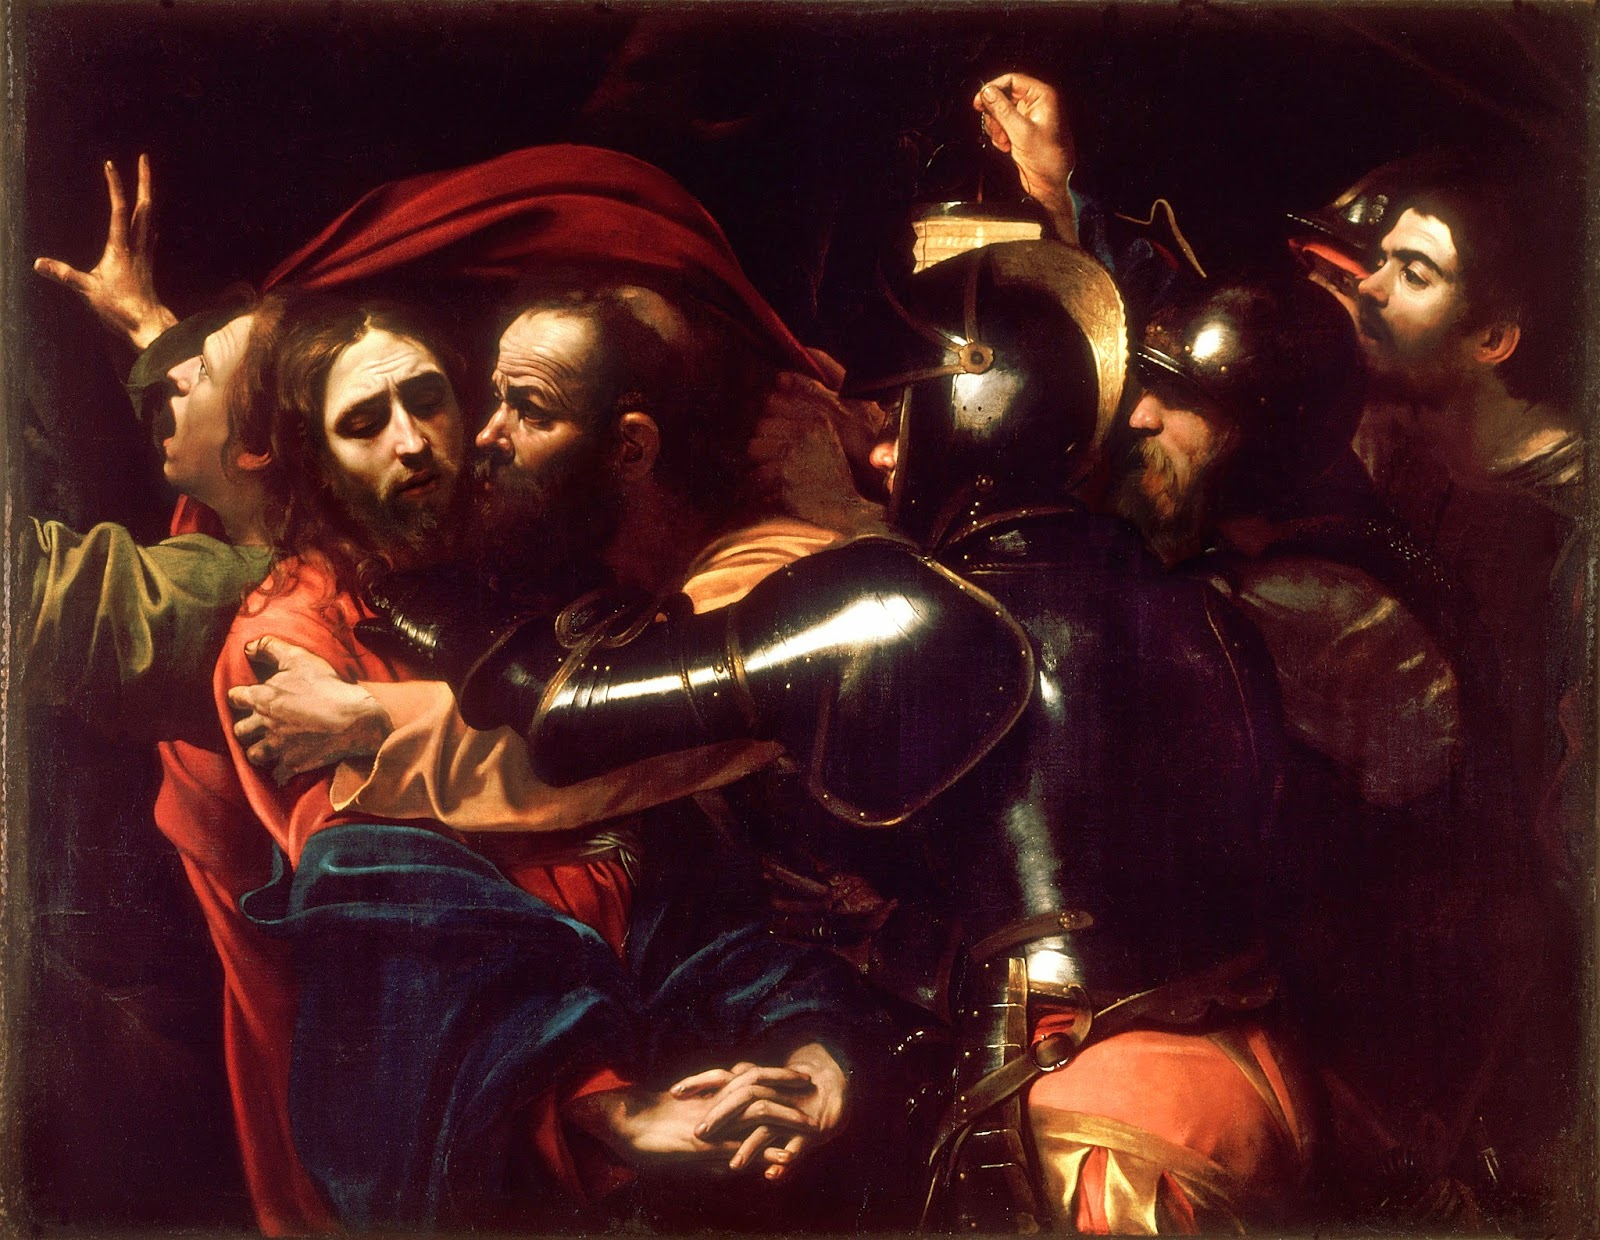 The Taking of Christ, Caravaggio